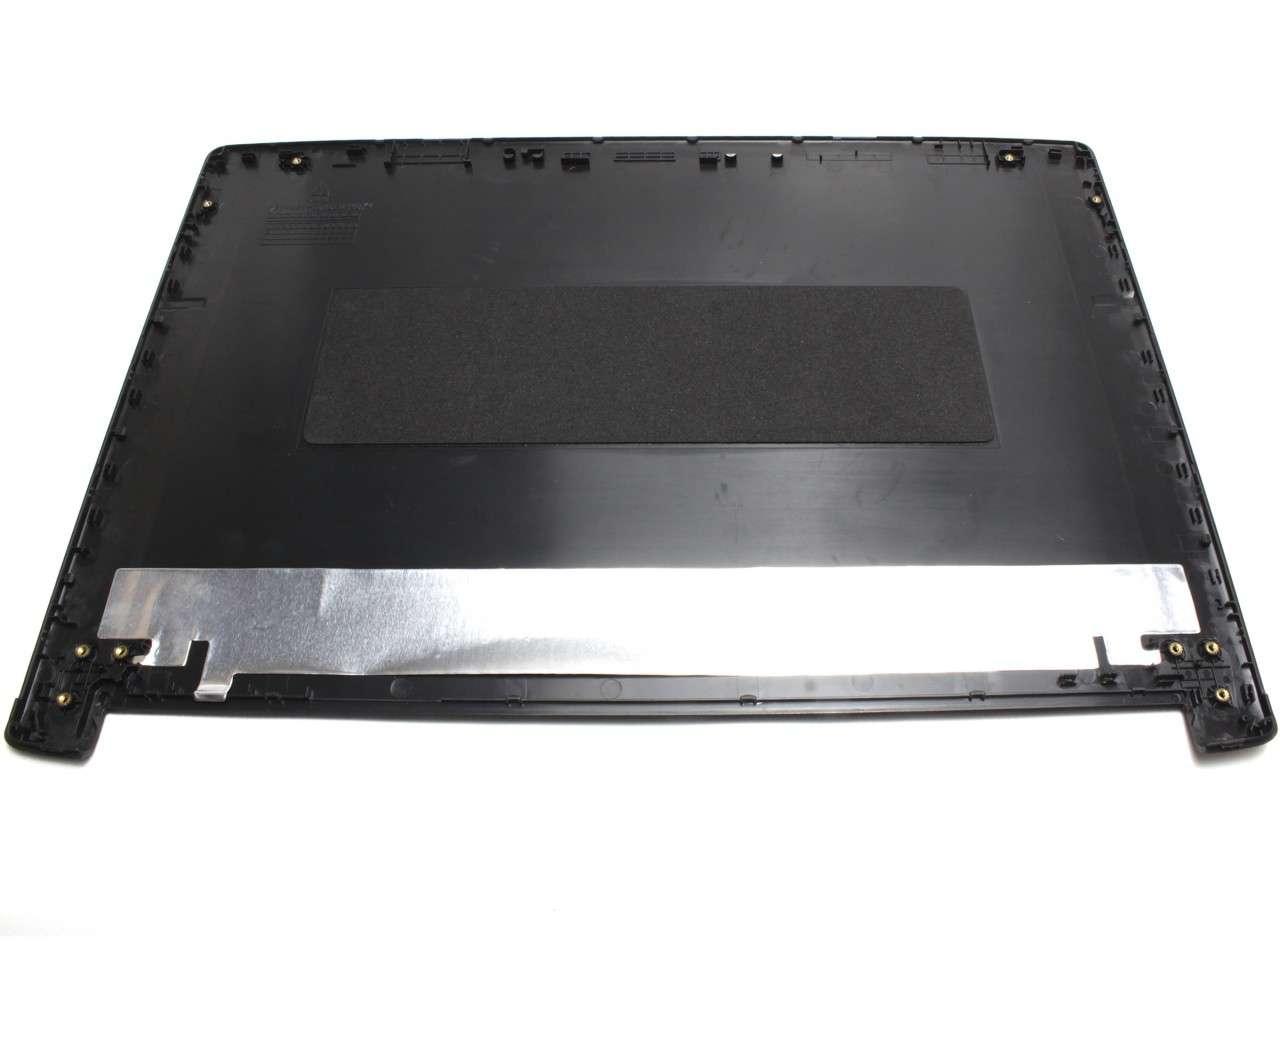 Capac Display BackCover Acer A715-71G-55R7 Carcasa Display imagine powerlaptop.ro 2021